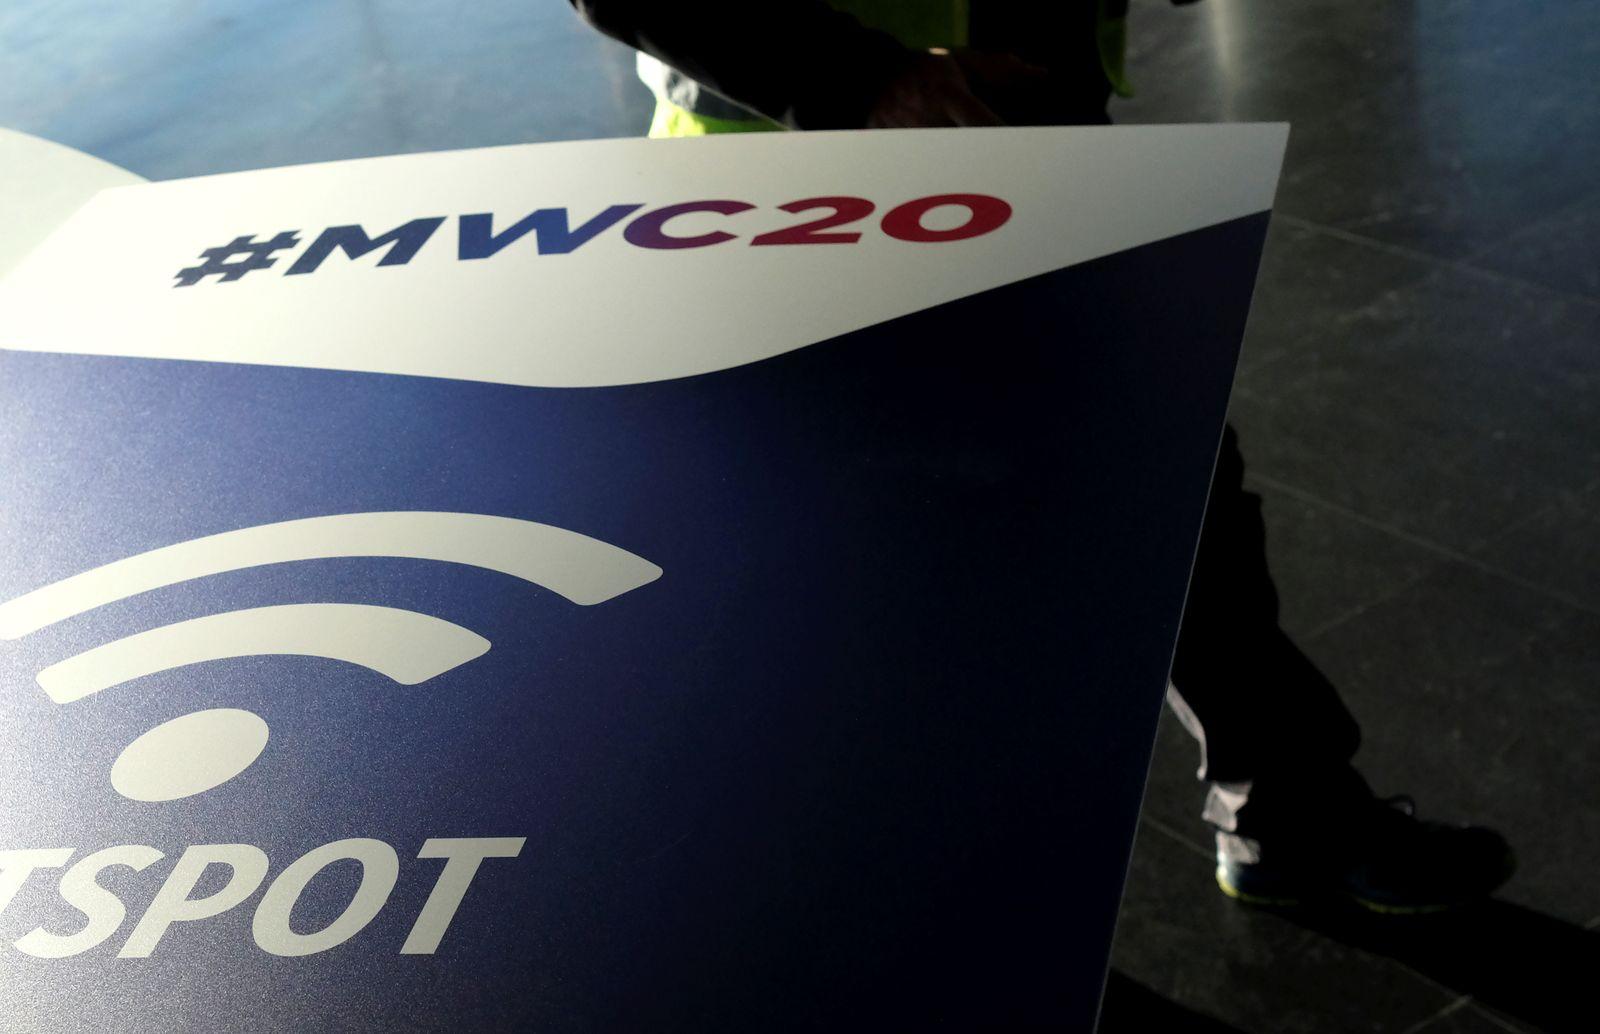 An employee walks past an MWC20 banner in Barcelona